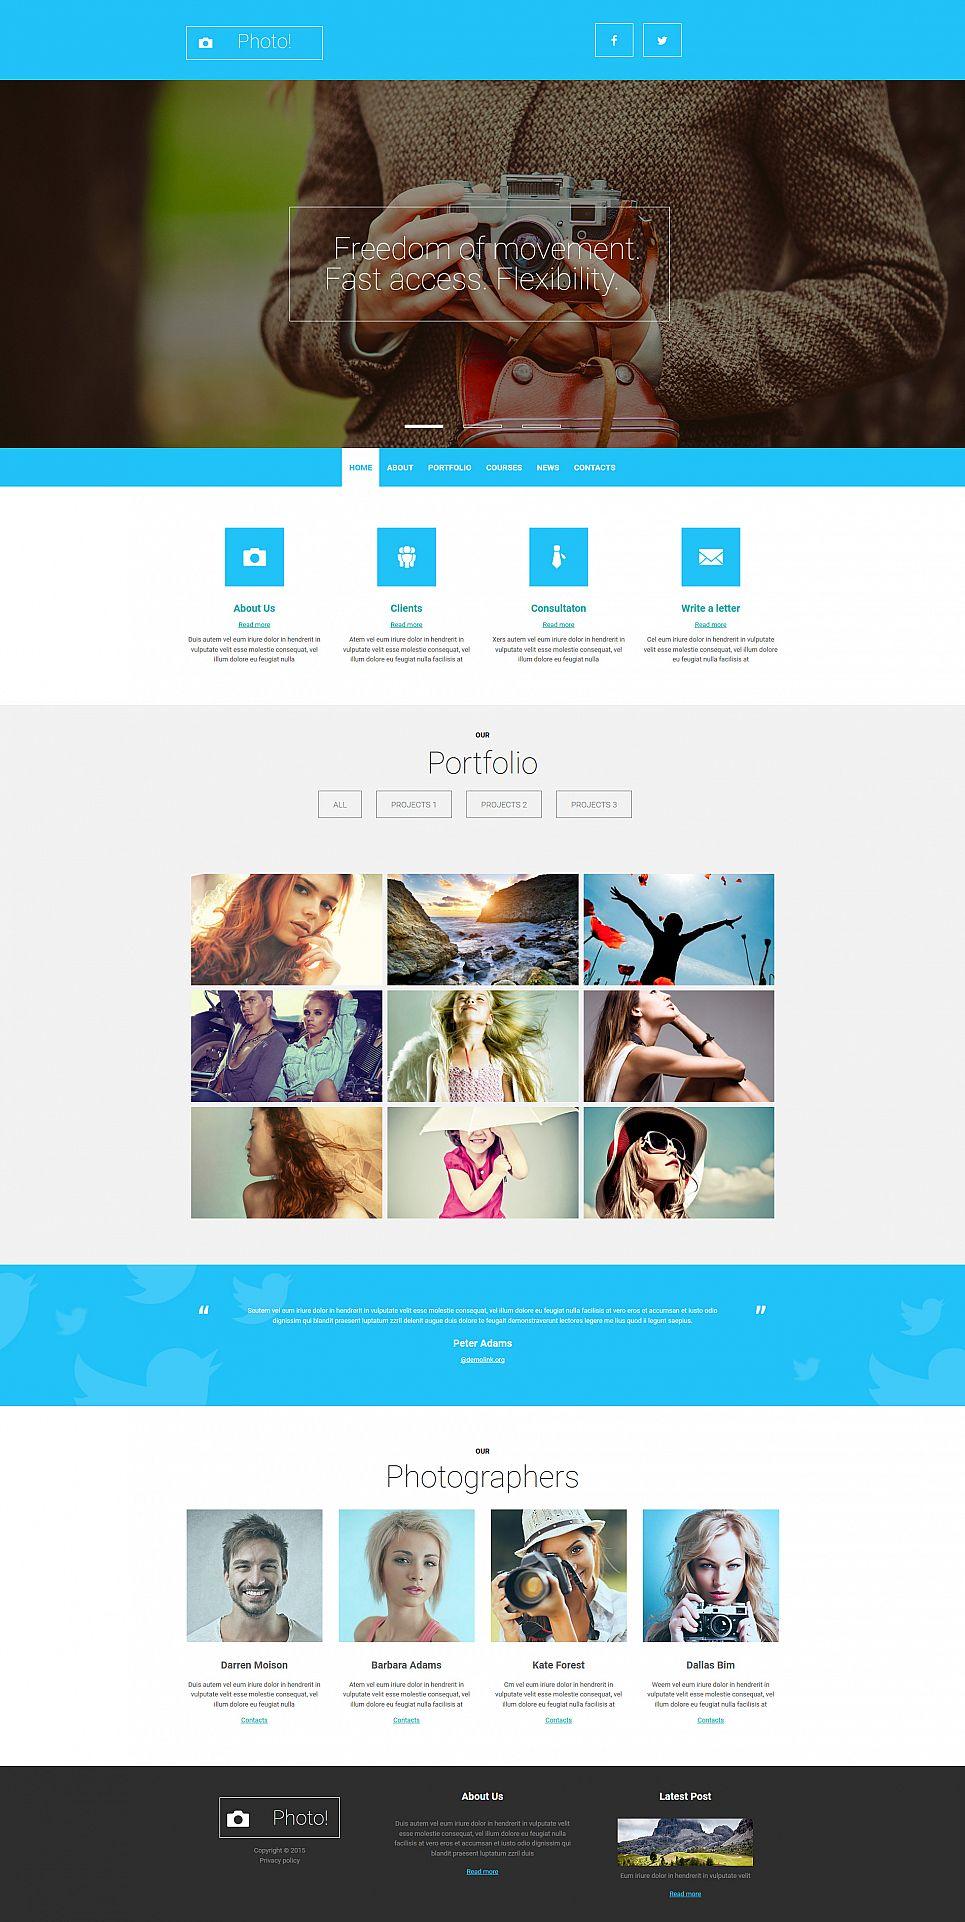 Responsive Photography Website Design - image